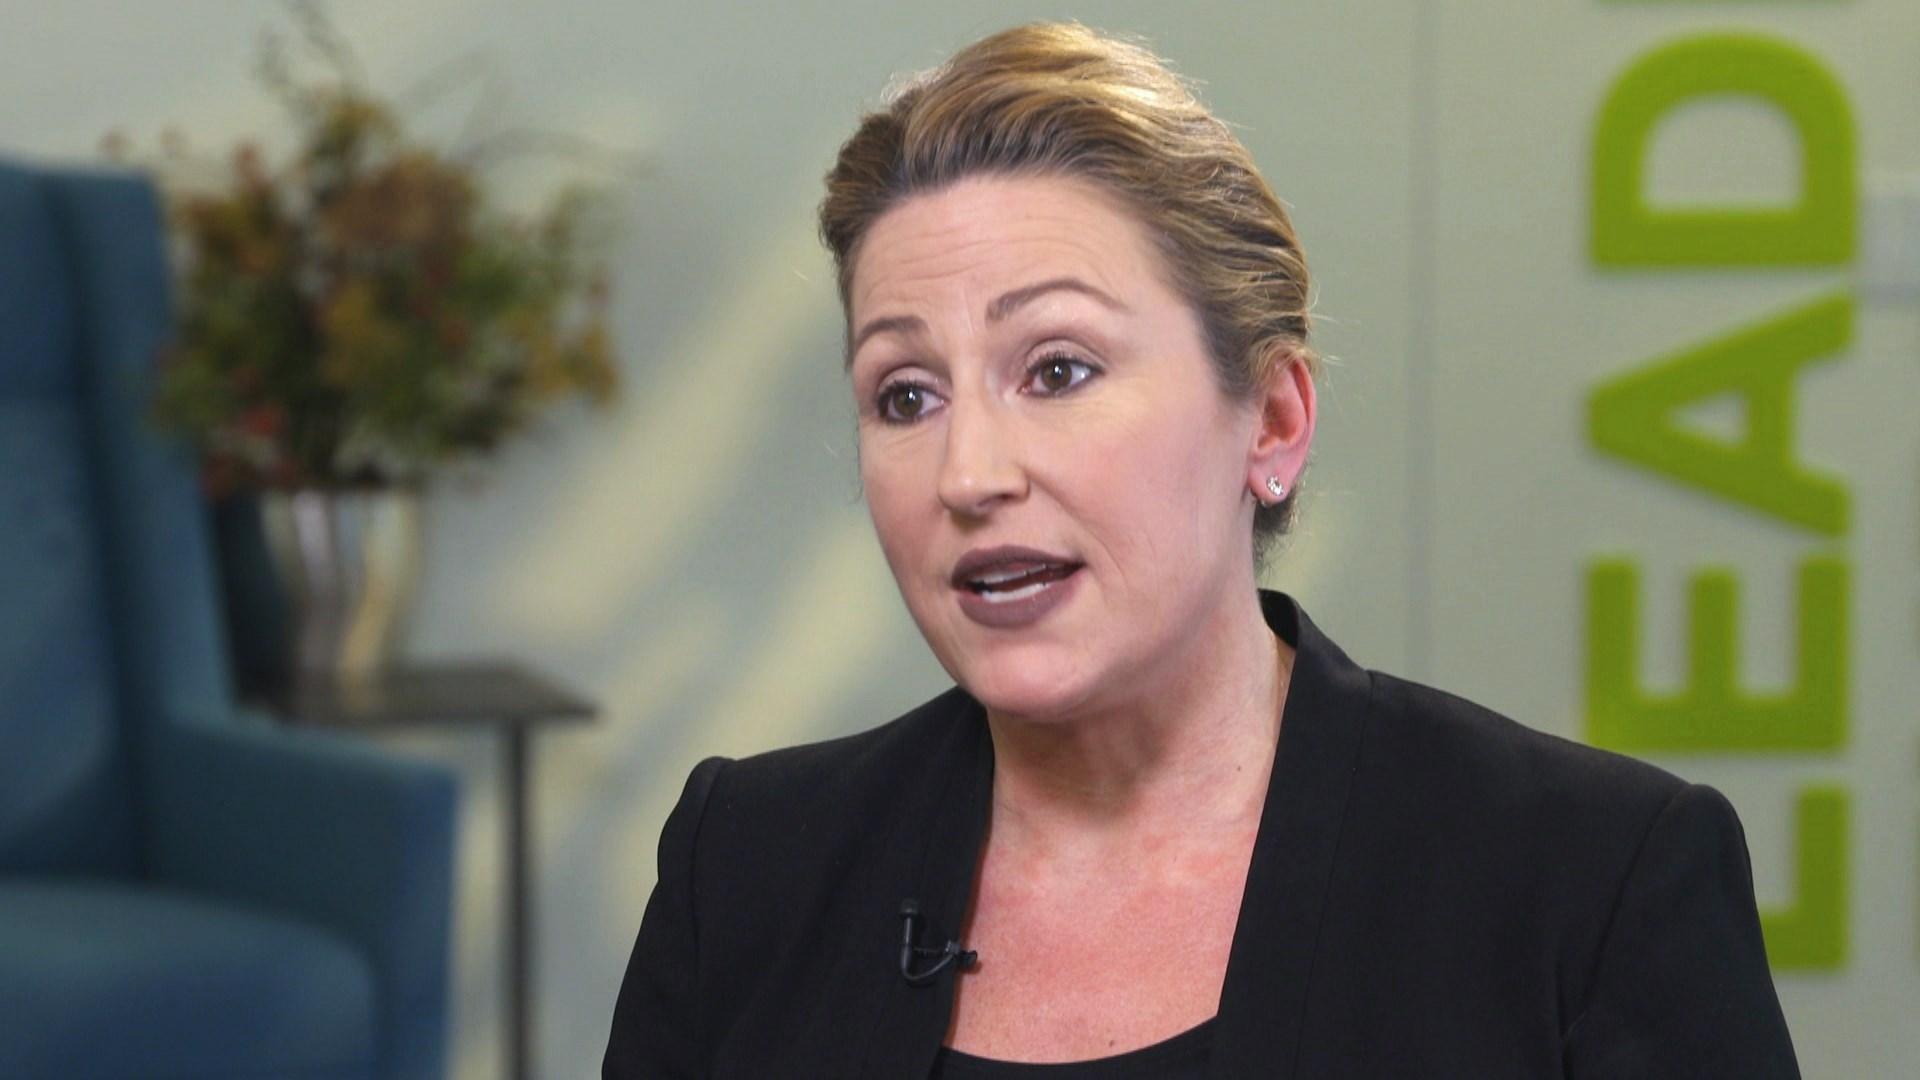 EpiPen price hike controversy: Mylan CEO Heather Bresch